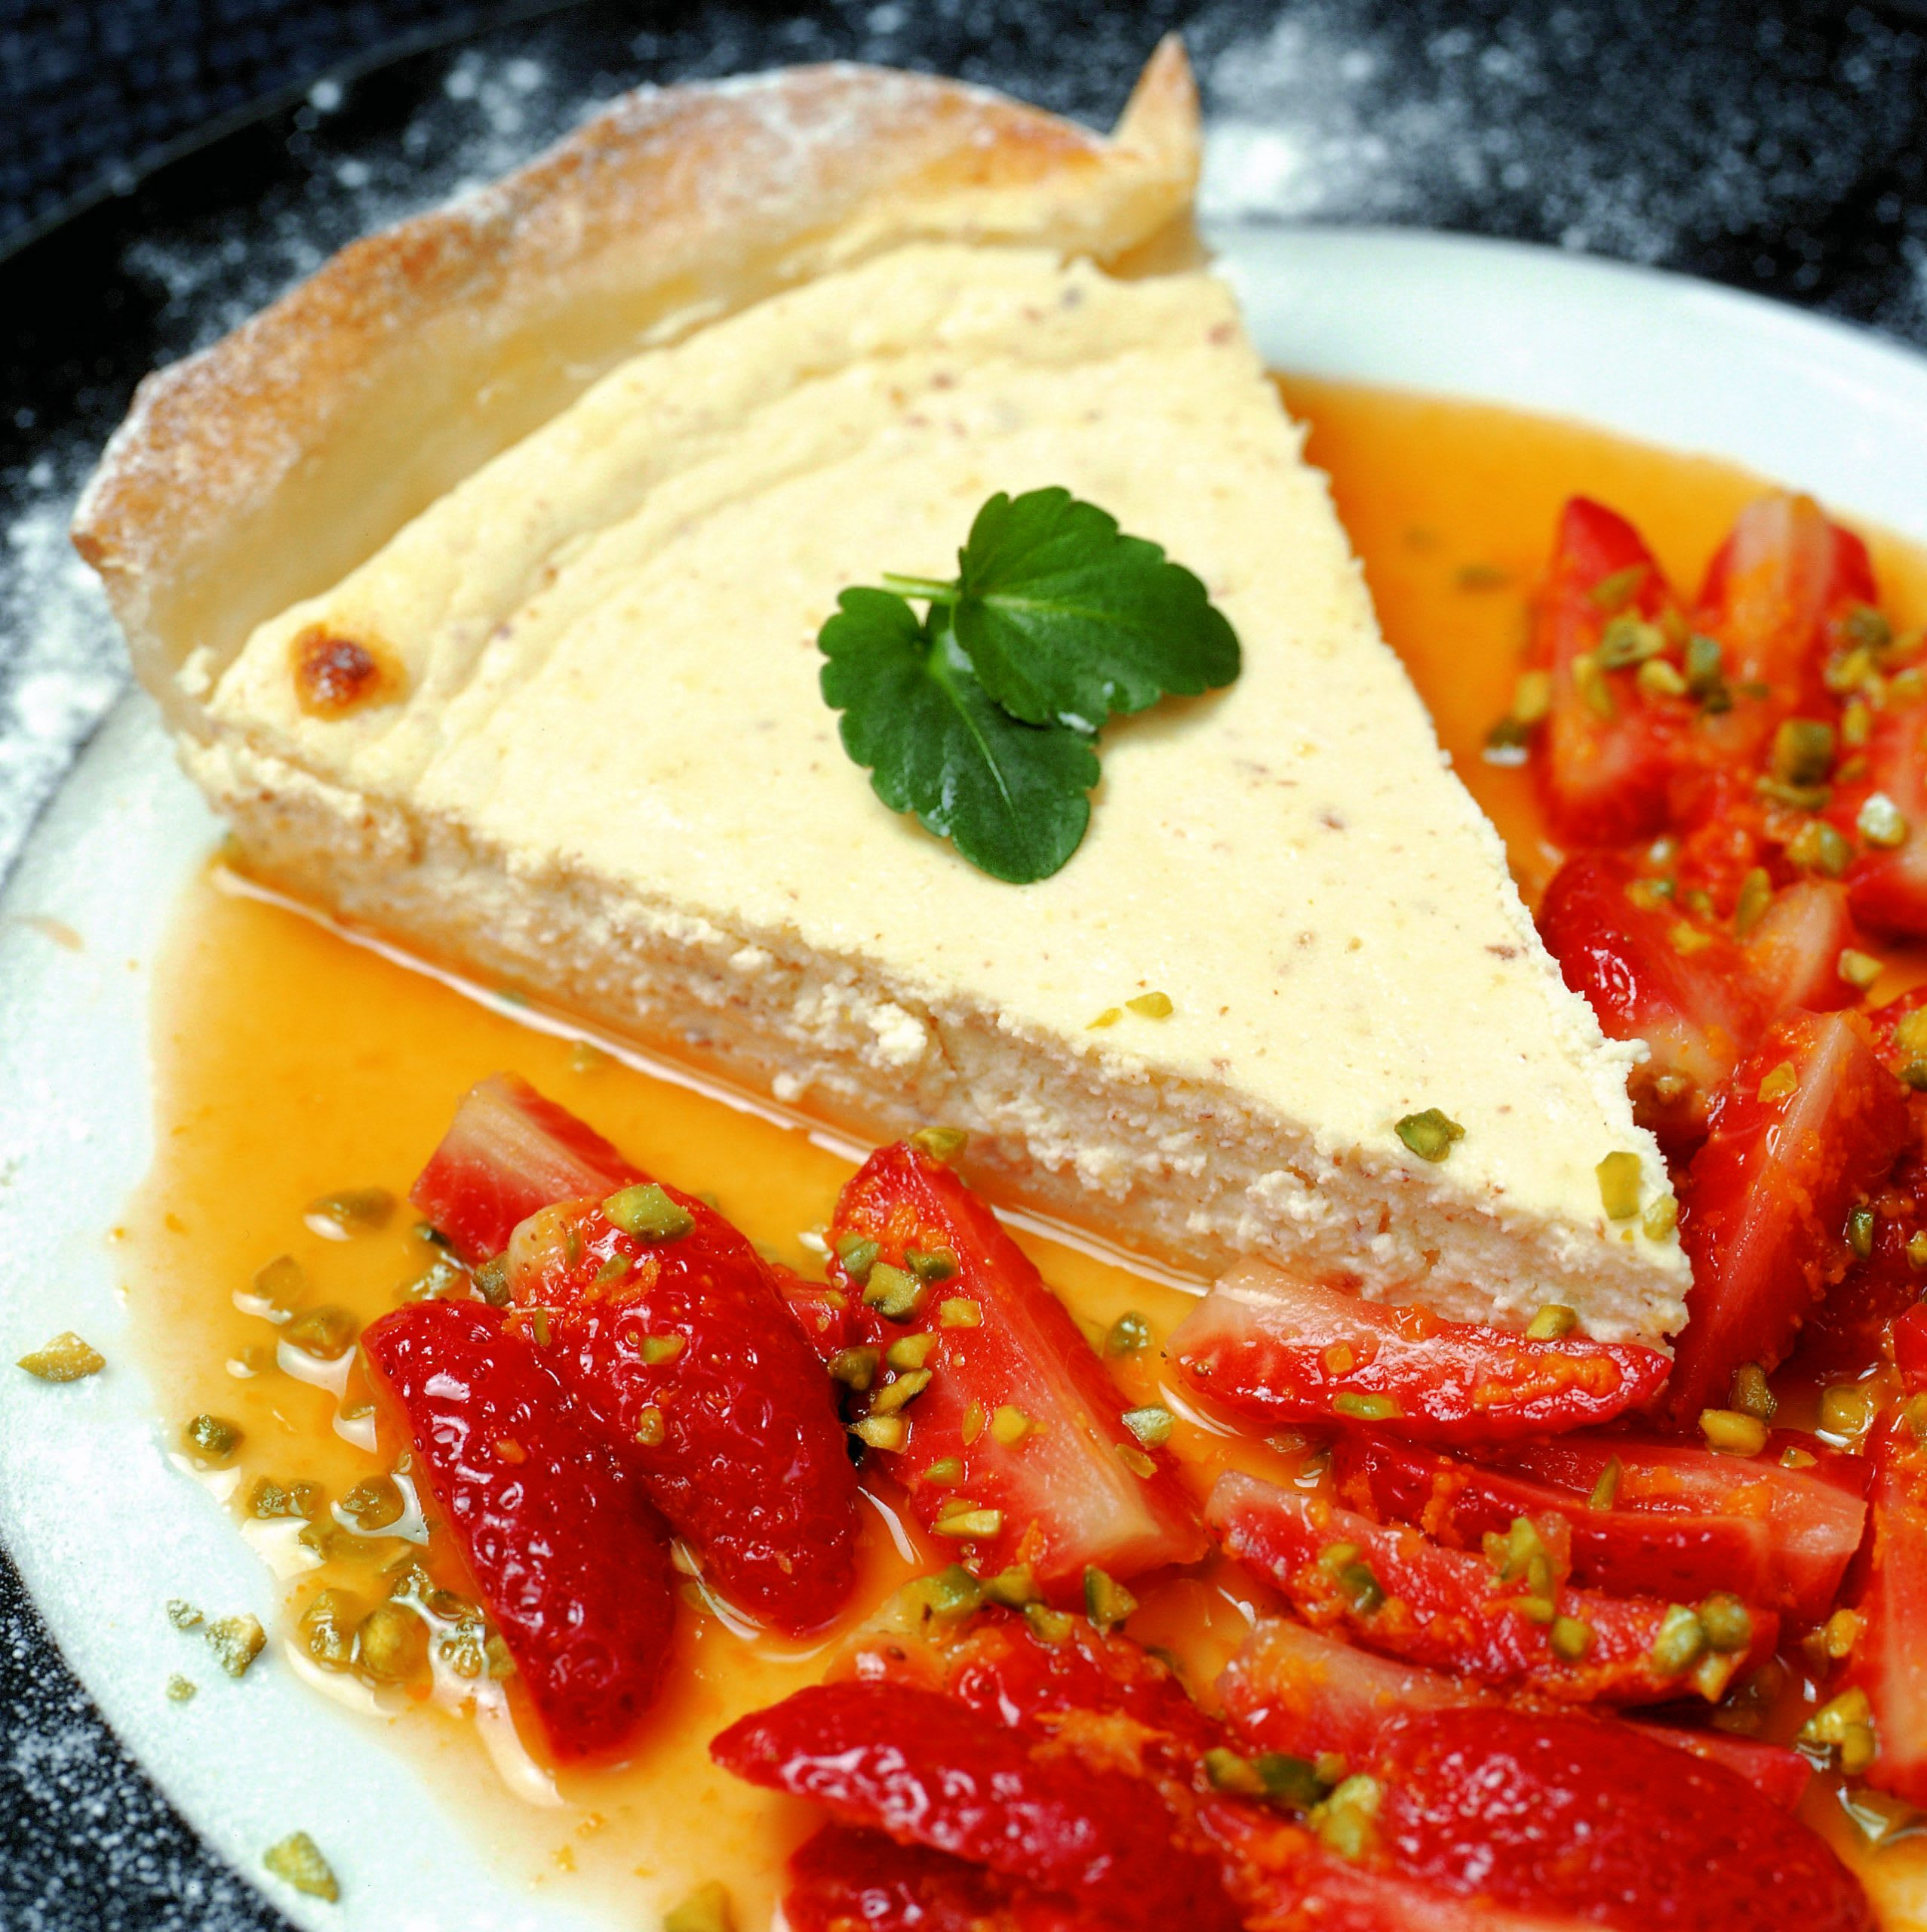 Tarte au séré tiède garnie de fraises